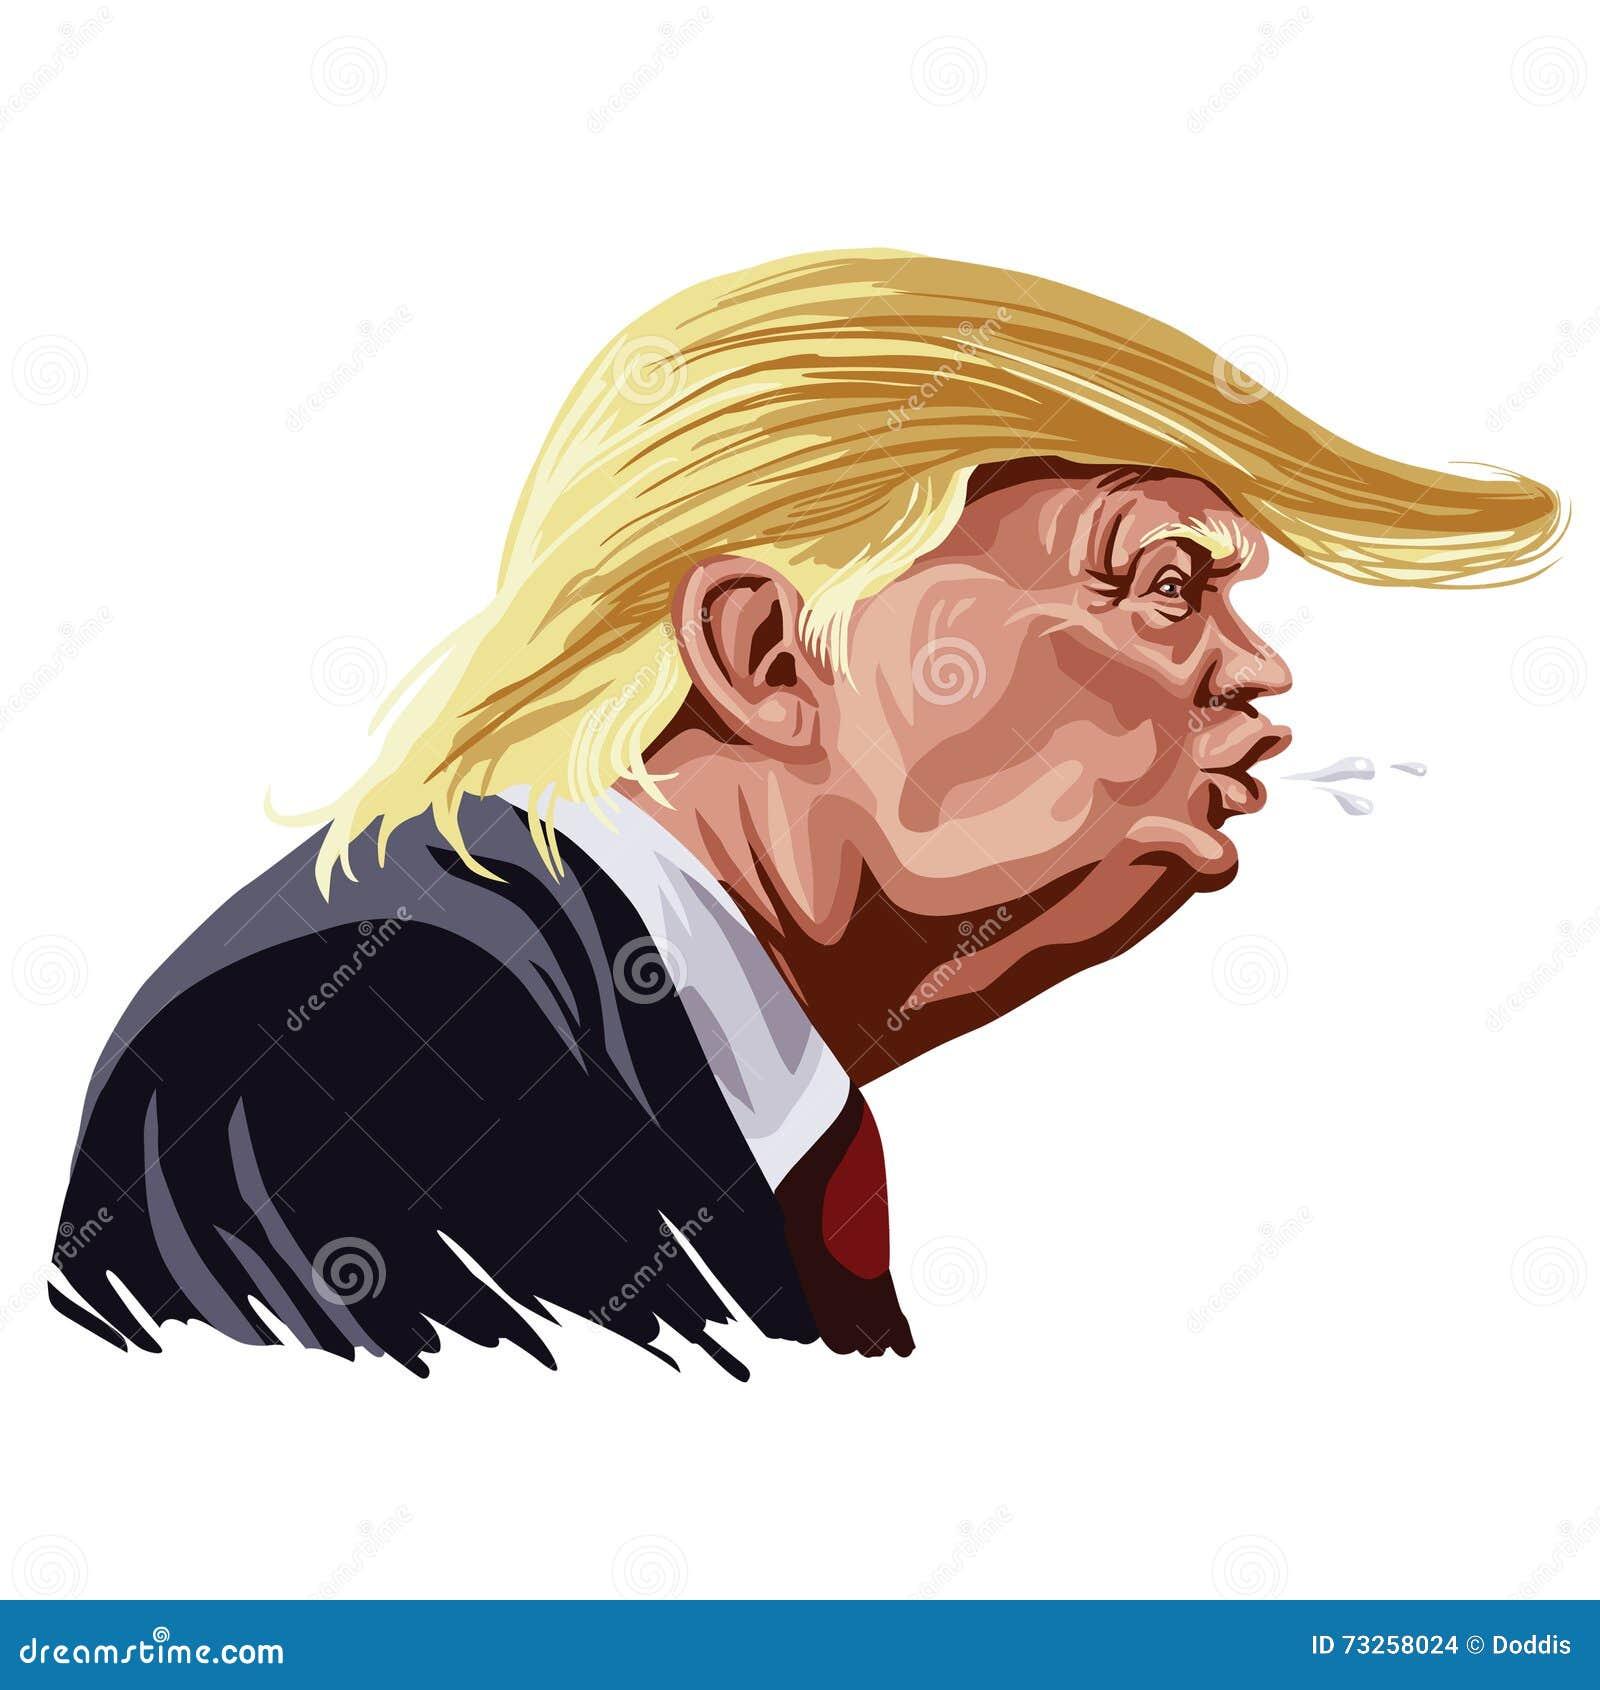 Вектор шаржа Дональд Трамп